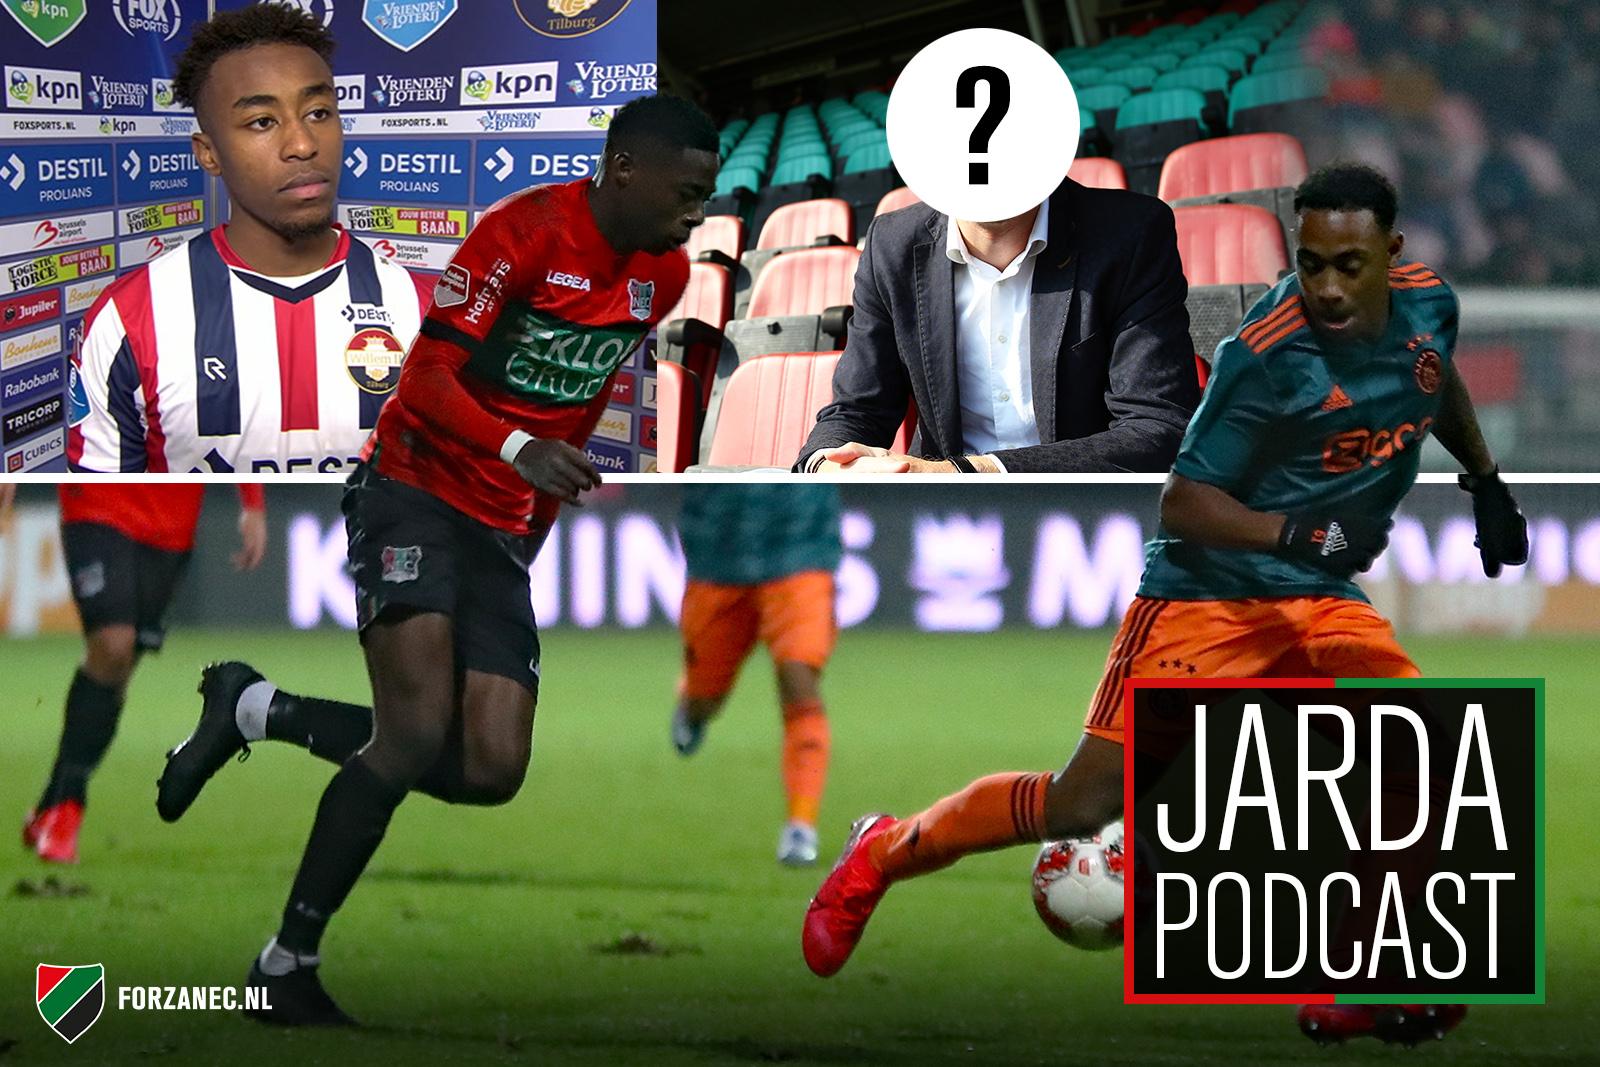 Jarda Podcast #34: Punt tegen de 'Ajax A1' en profielschets van de td